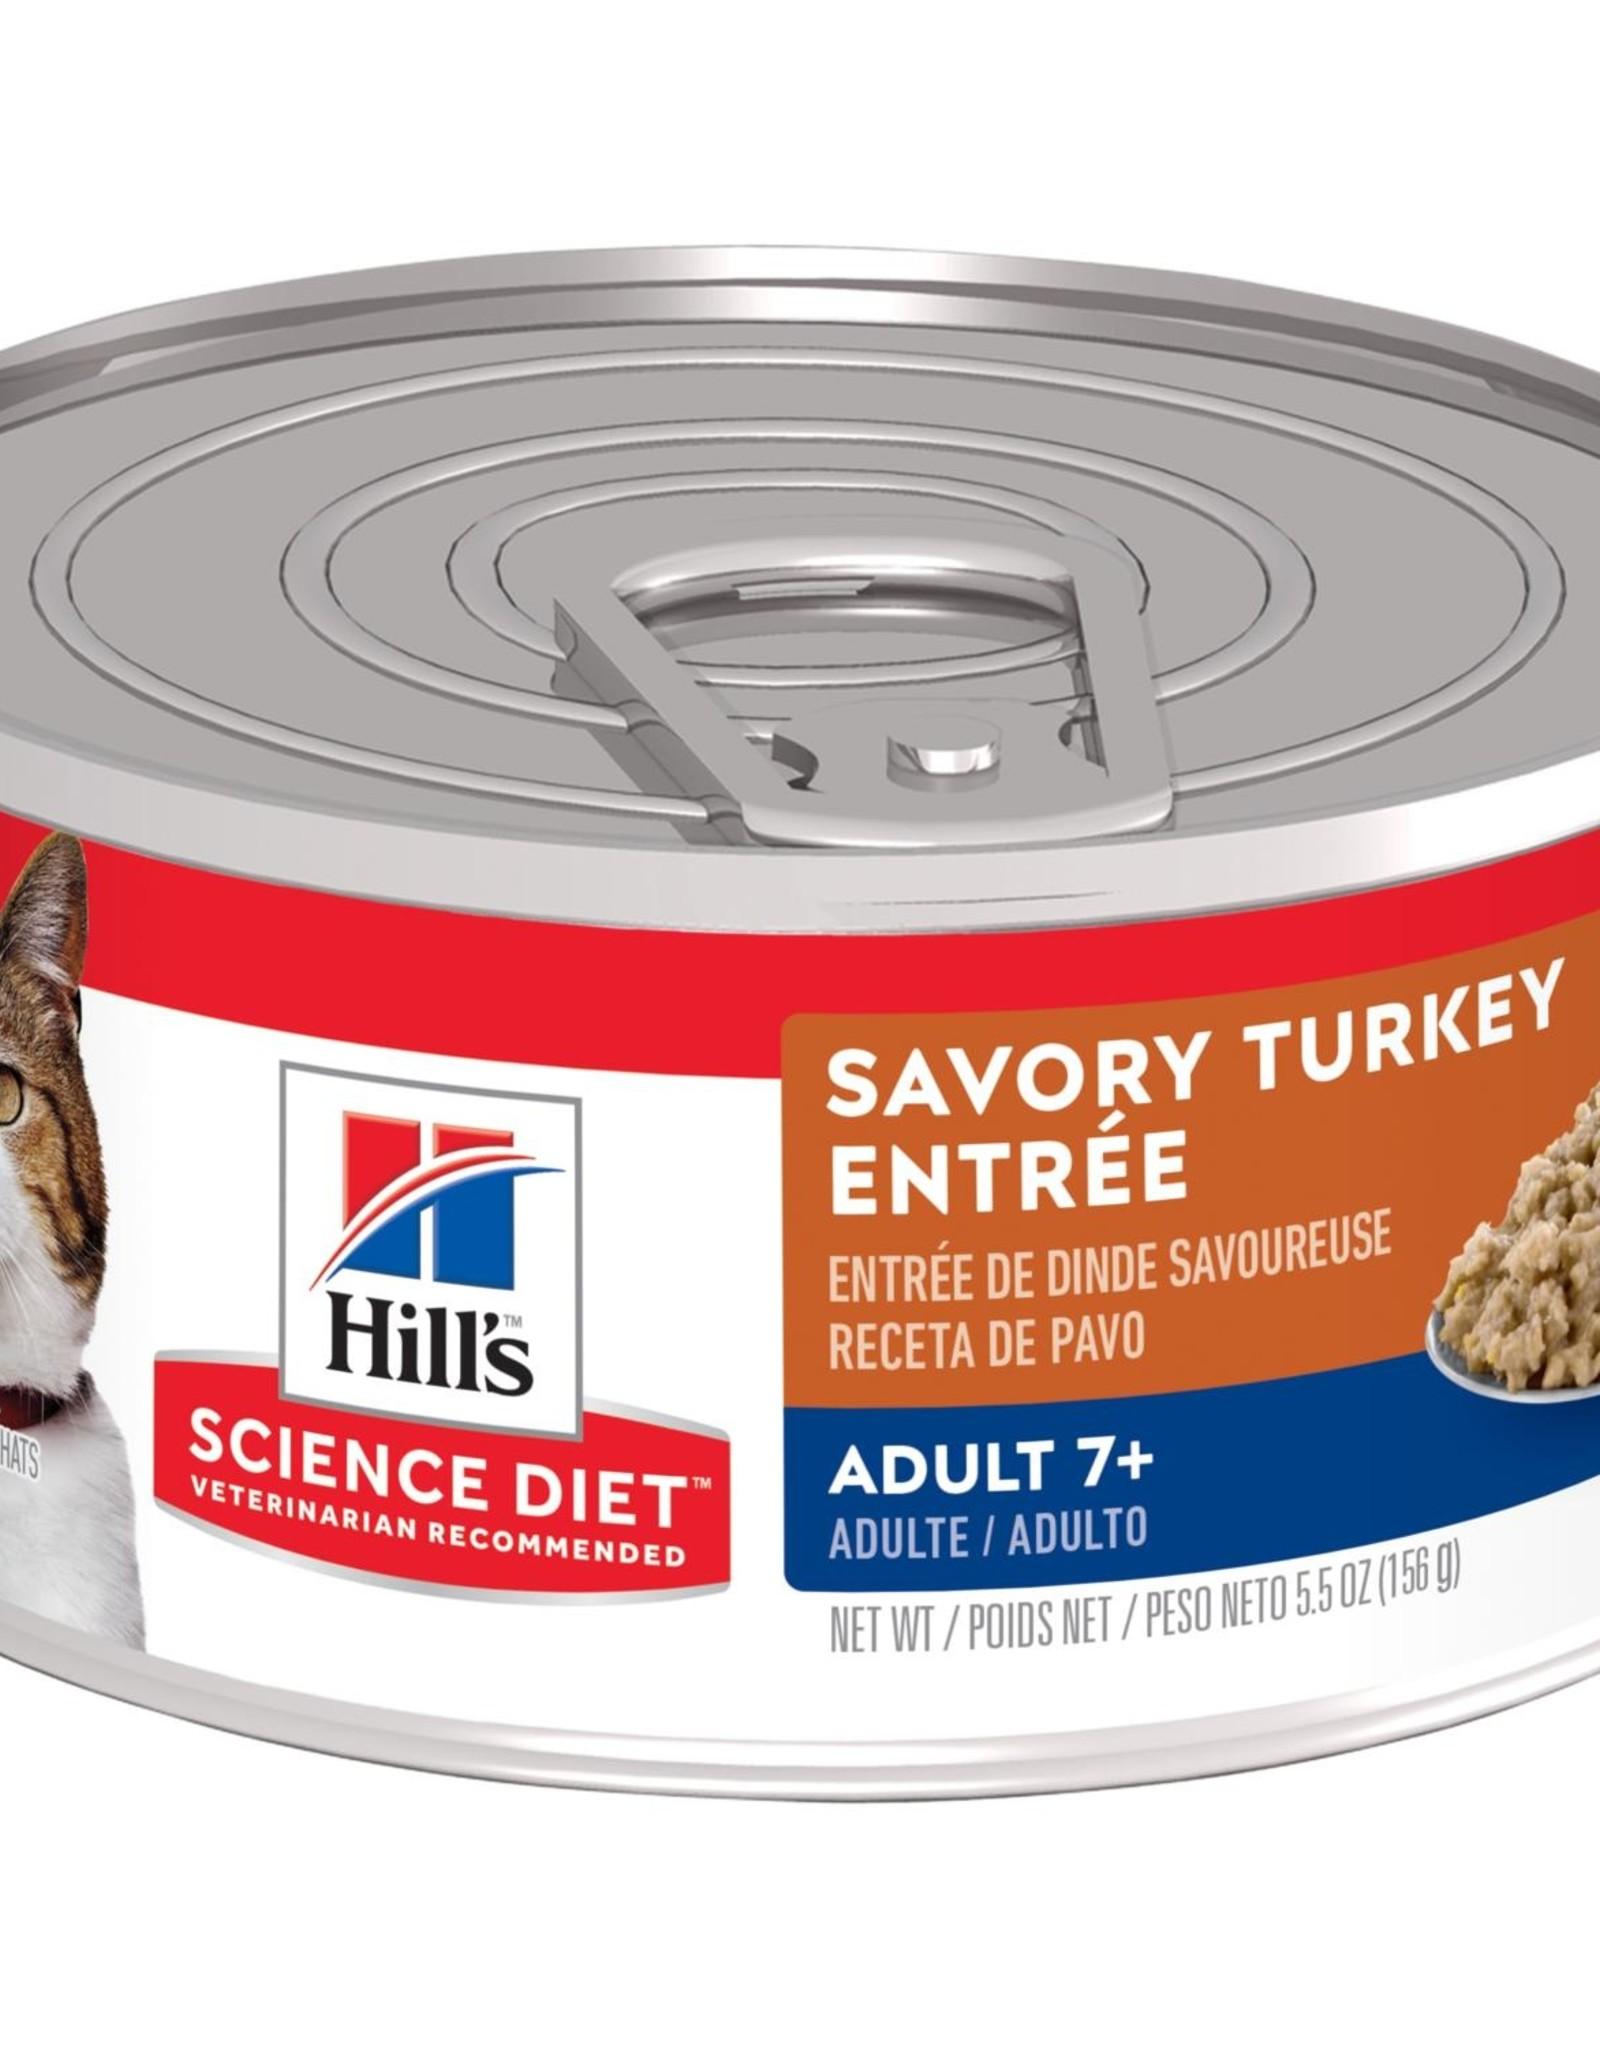 SCIENCE DIET HILL'S SCIENCE DIET FELINE CAN MATURE GOURMET TURKEY 2.9OZ CASE OF 24